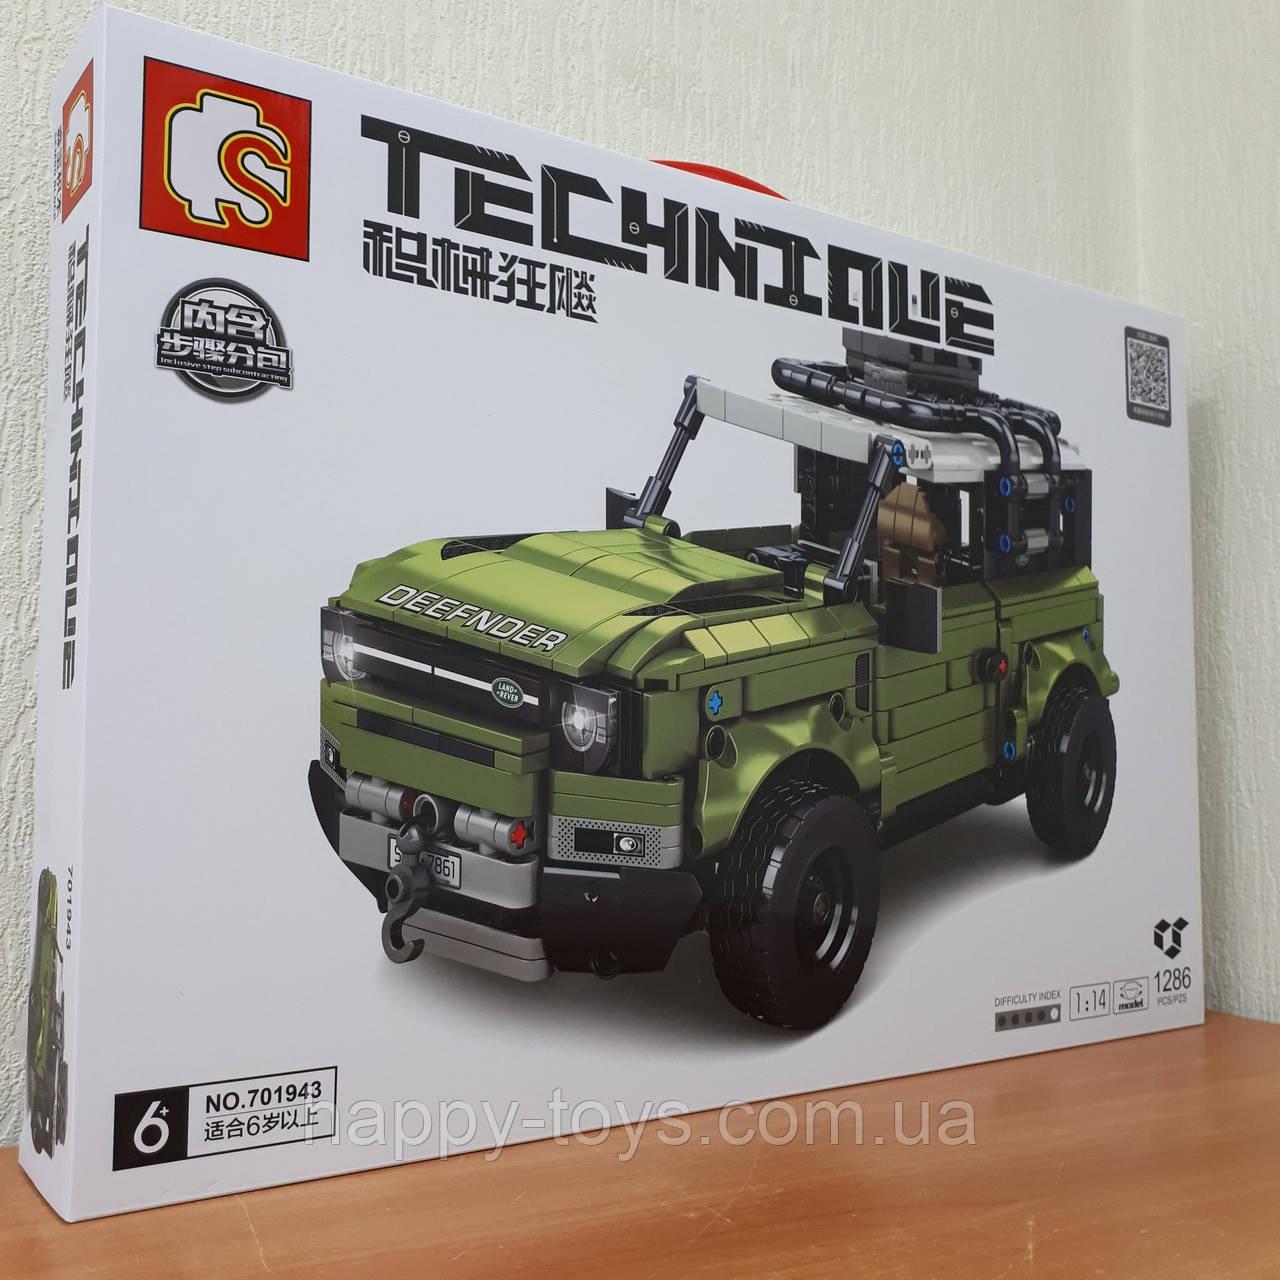 Конструктор Land Rover Defender Джип Внедорожник Ленд Ровер Дефендер 1:14 Sembo Block 701943 1286 деталей